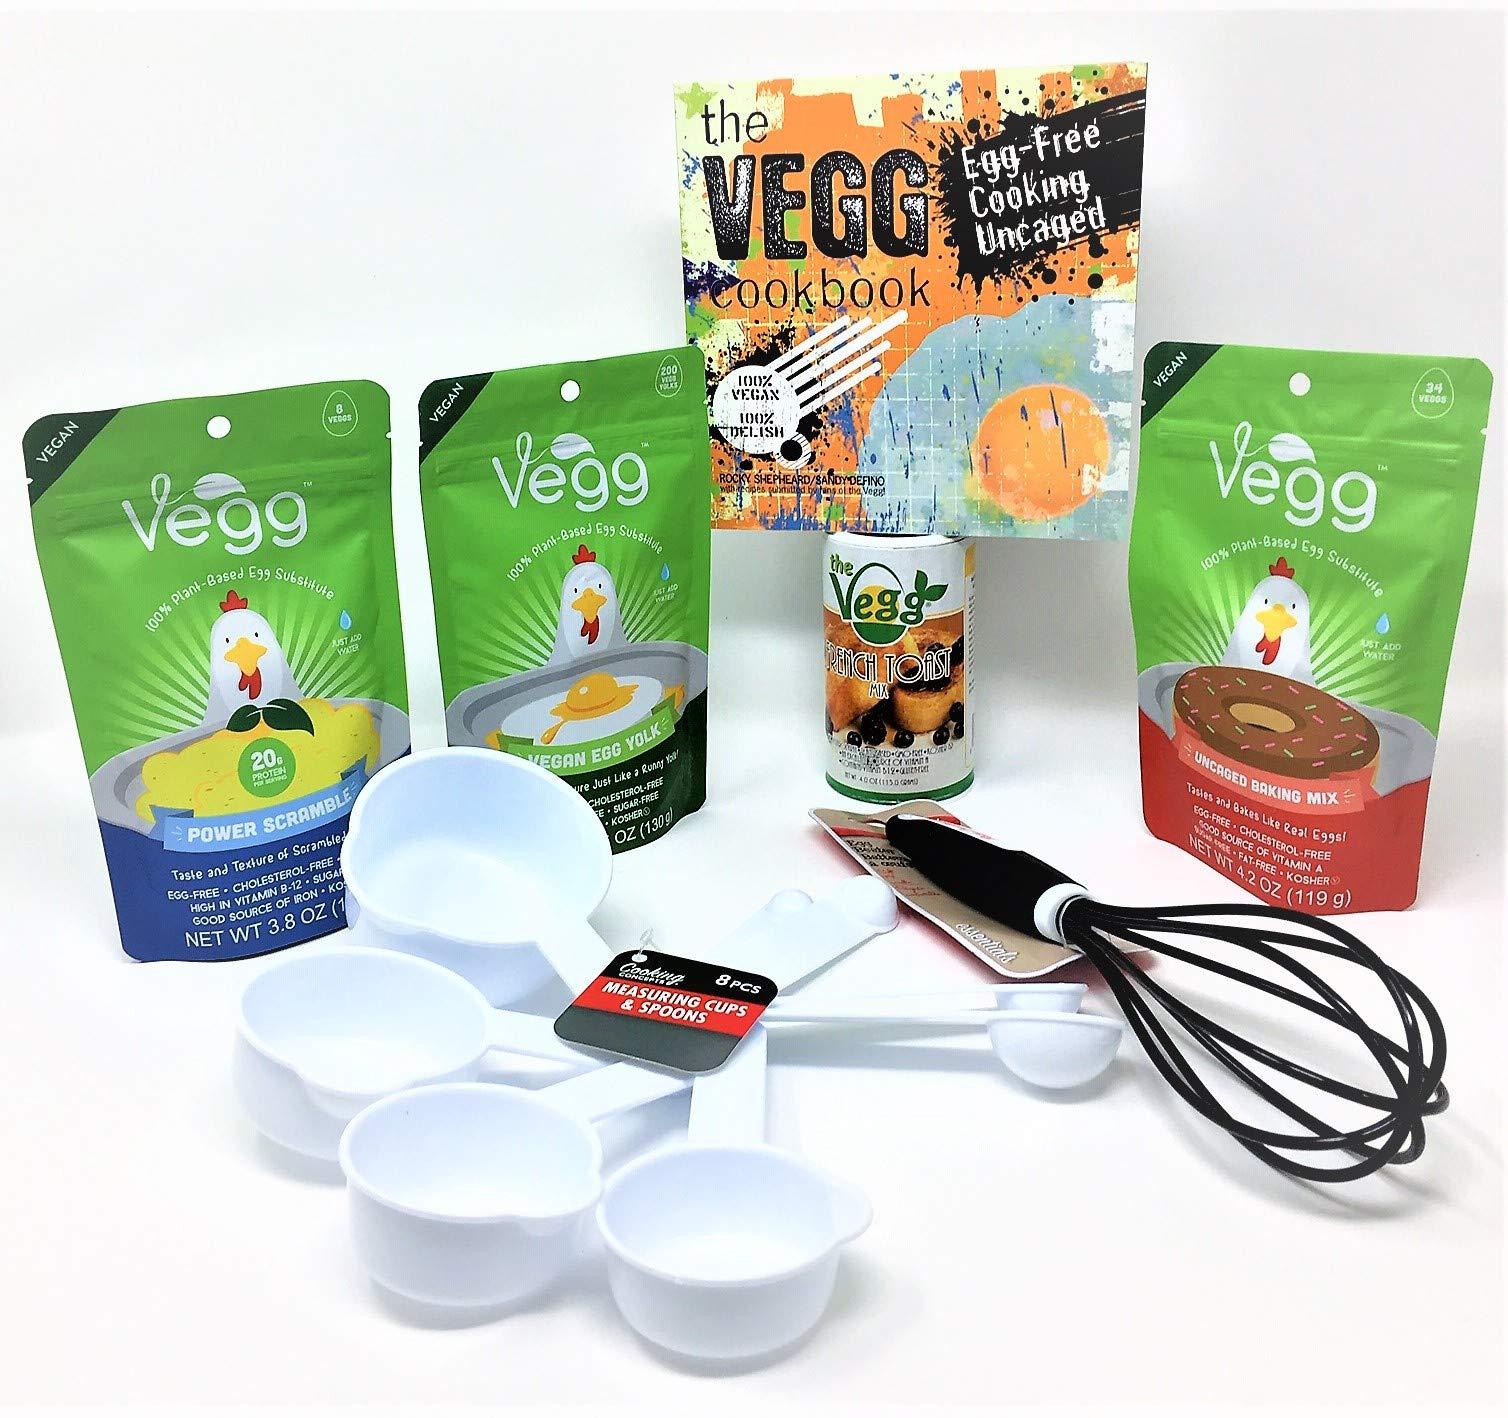 The Vegg Vegan Mega Pack Vegan Egg Yolk + Power Scramble + French Toast Mix + Uncaged Baking Mix + Egg Wisk + Measuring Cups and Spoons + The Vegg Cookbook by The Vegg (Image #1)